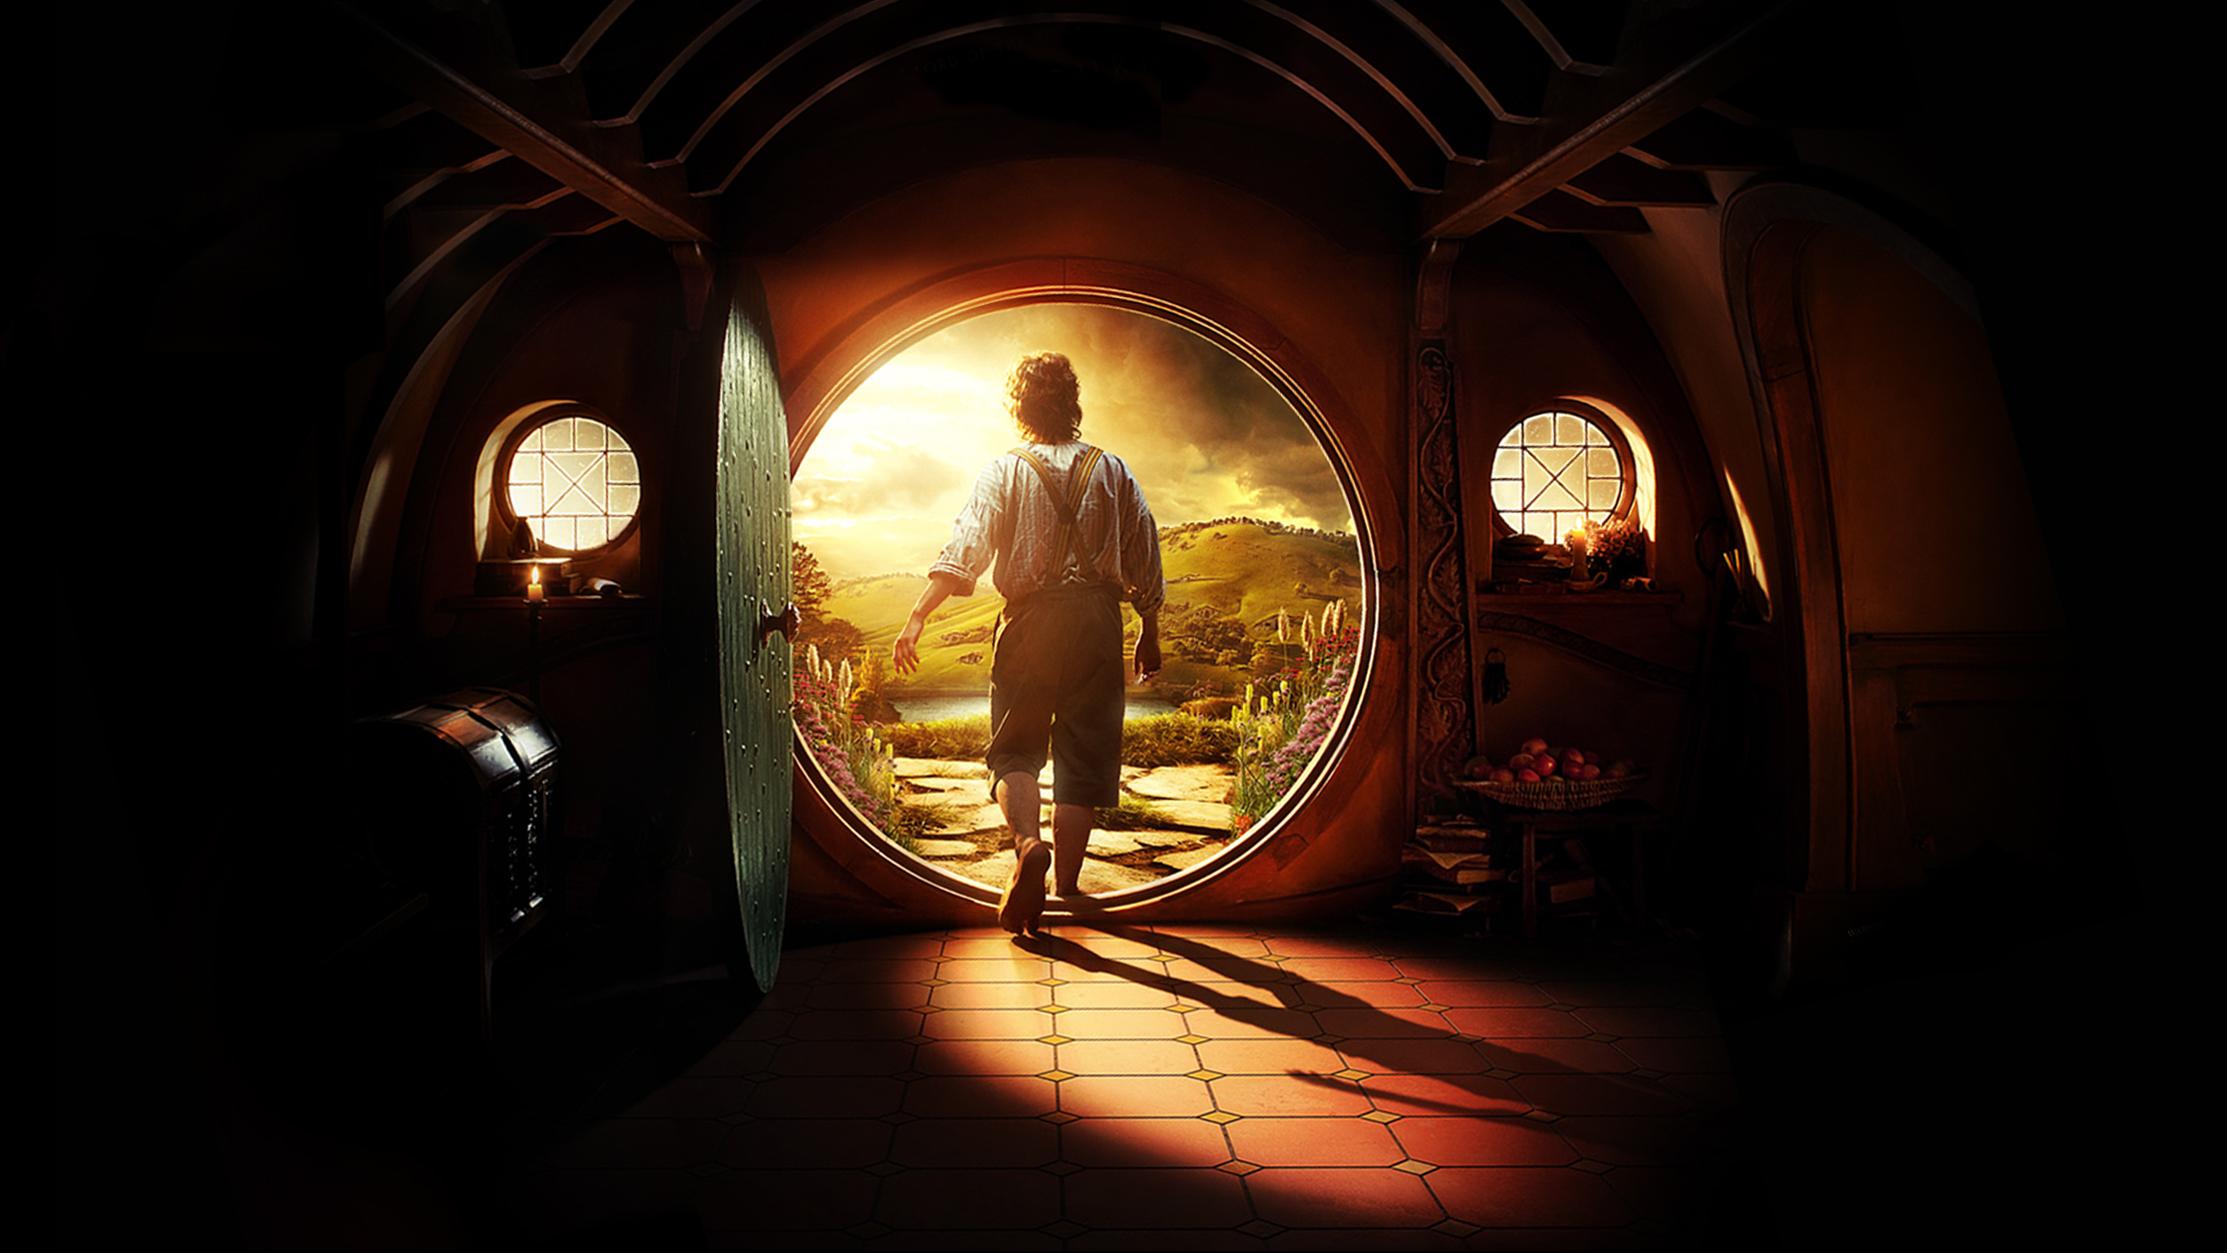 Fotos   The Hobbit The Hobbit Wallpaper 2227x1253